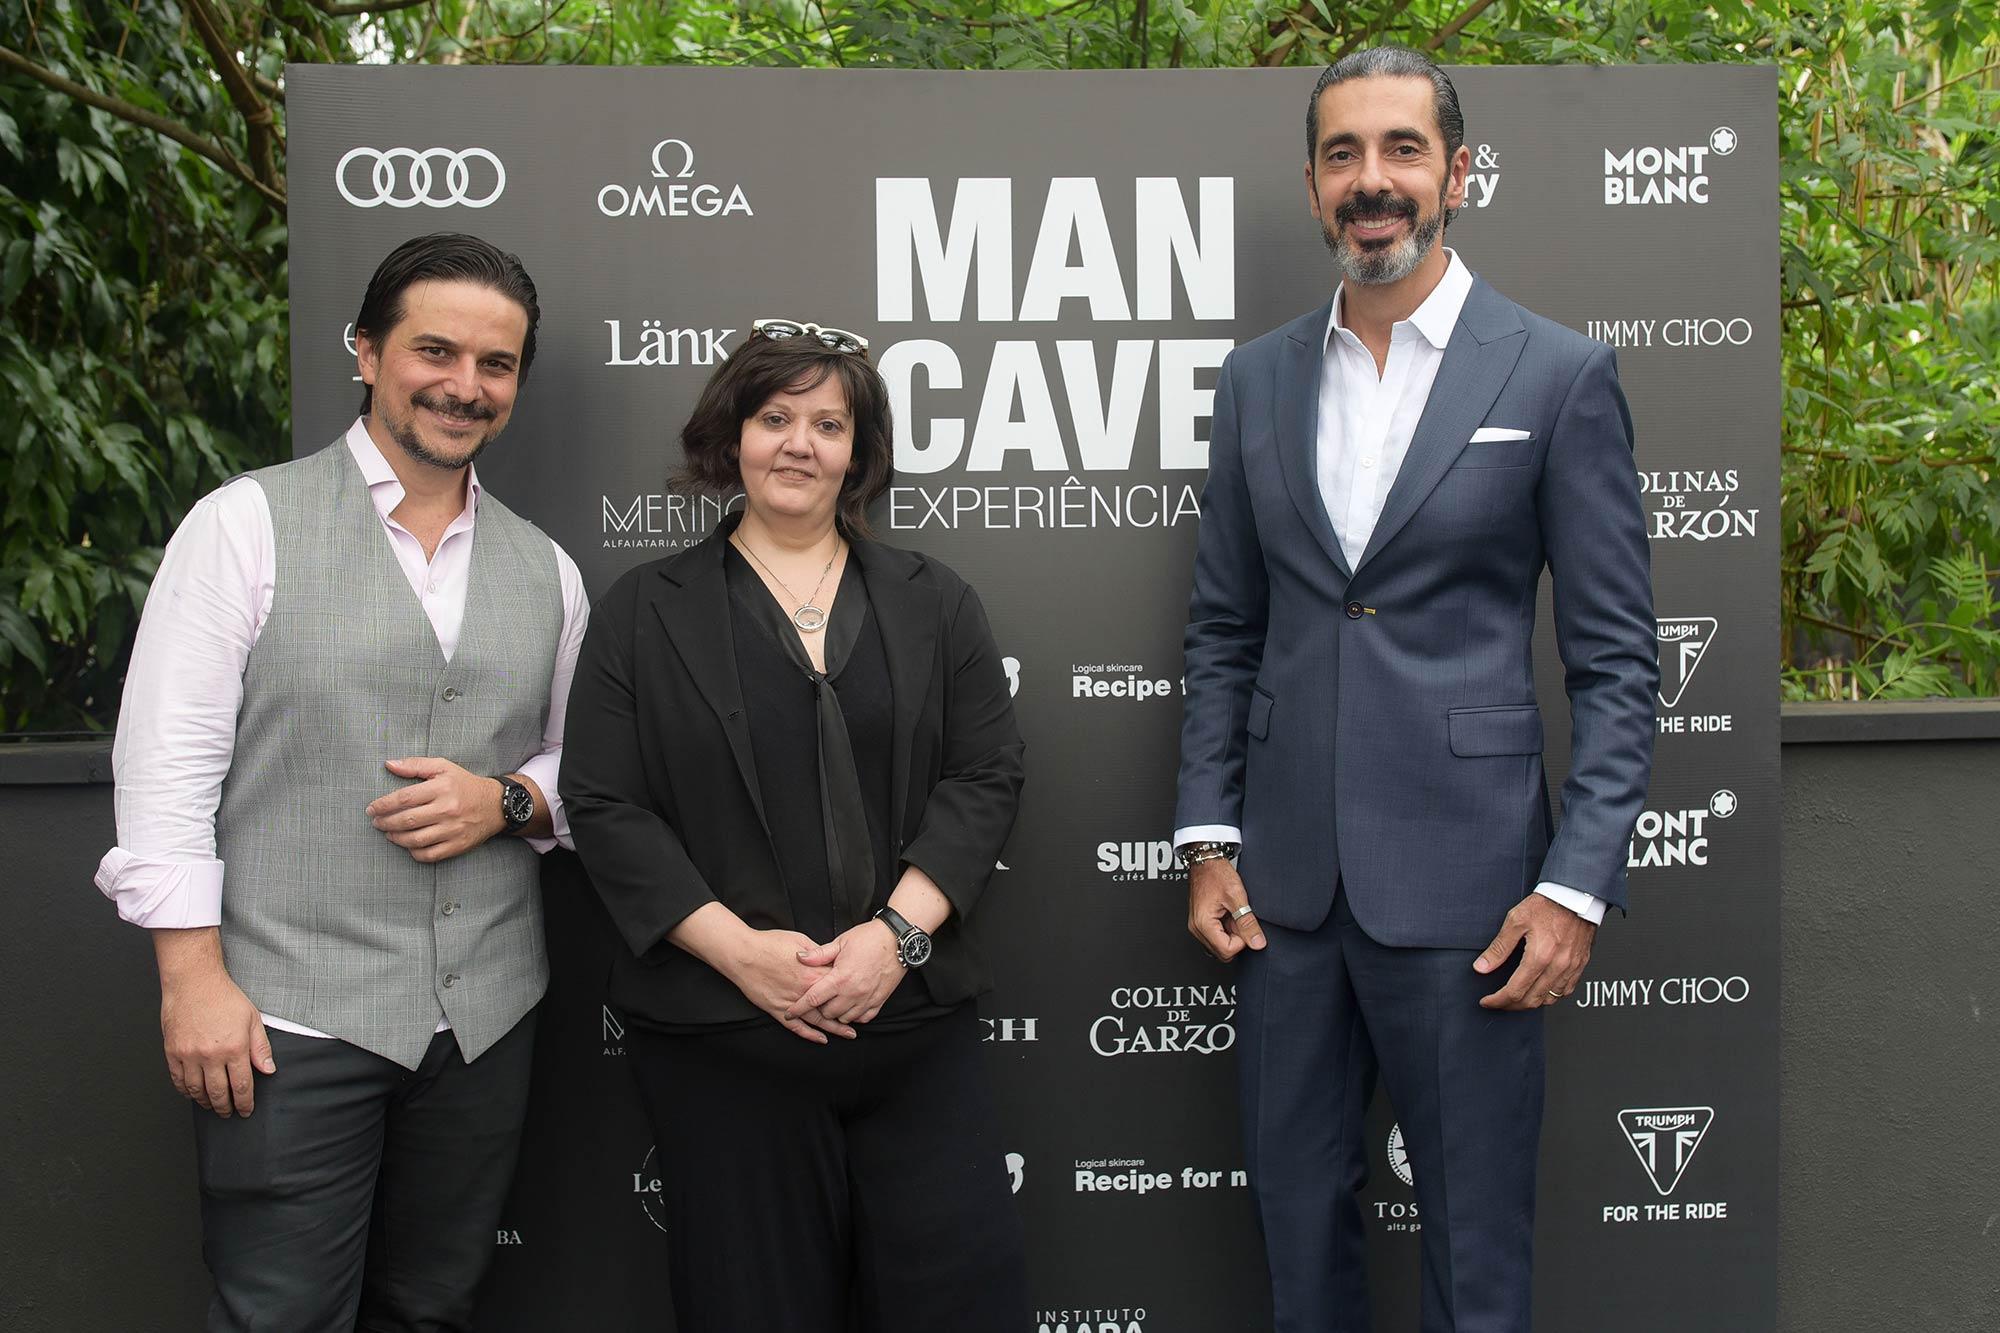 Man Cave Experiências Alessander Guerra Daniella Abolin e Alexandre Taleb 6 - Man Cave Experiências